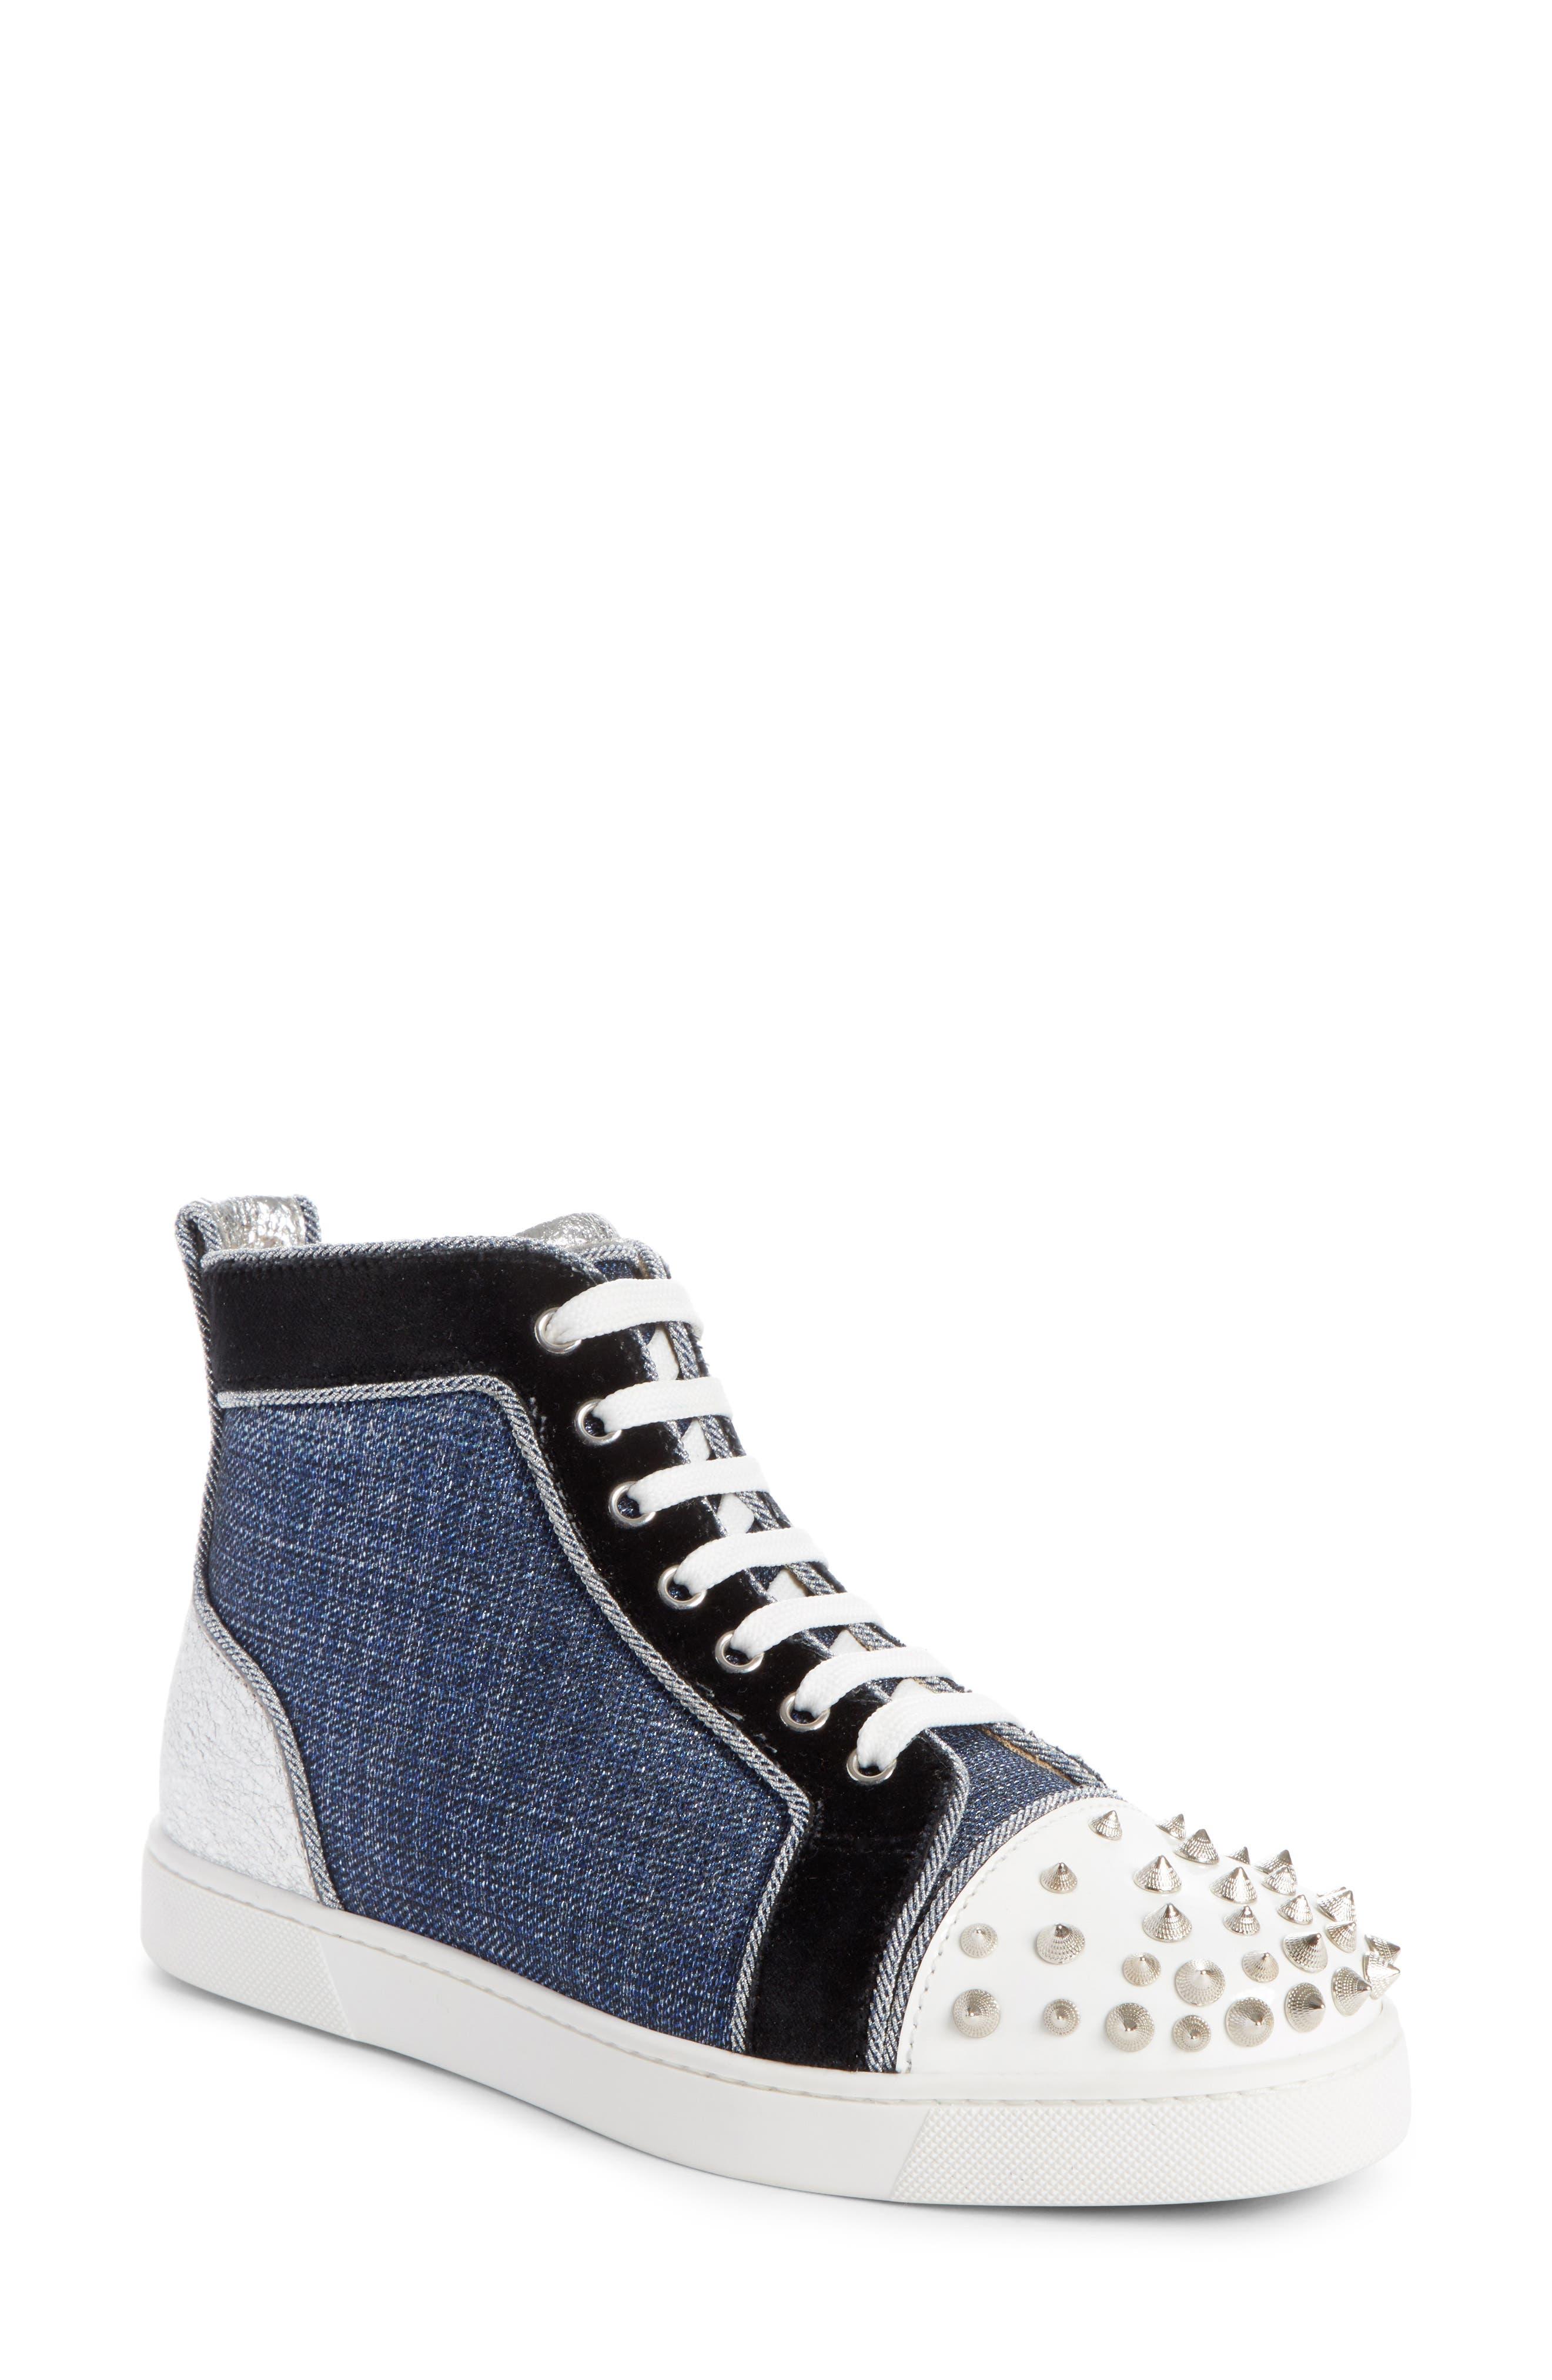 Lou Degra Spiked High Top Sneaker,                             Main thumbnail 1, color,                             Denim/ Silver